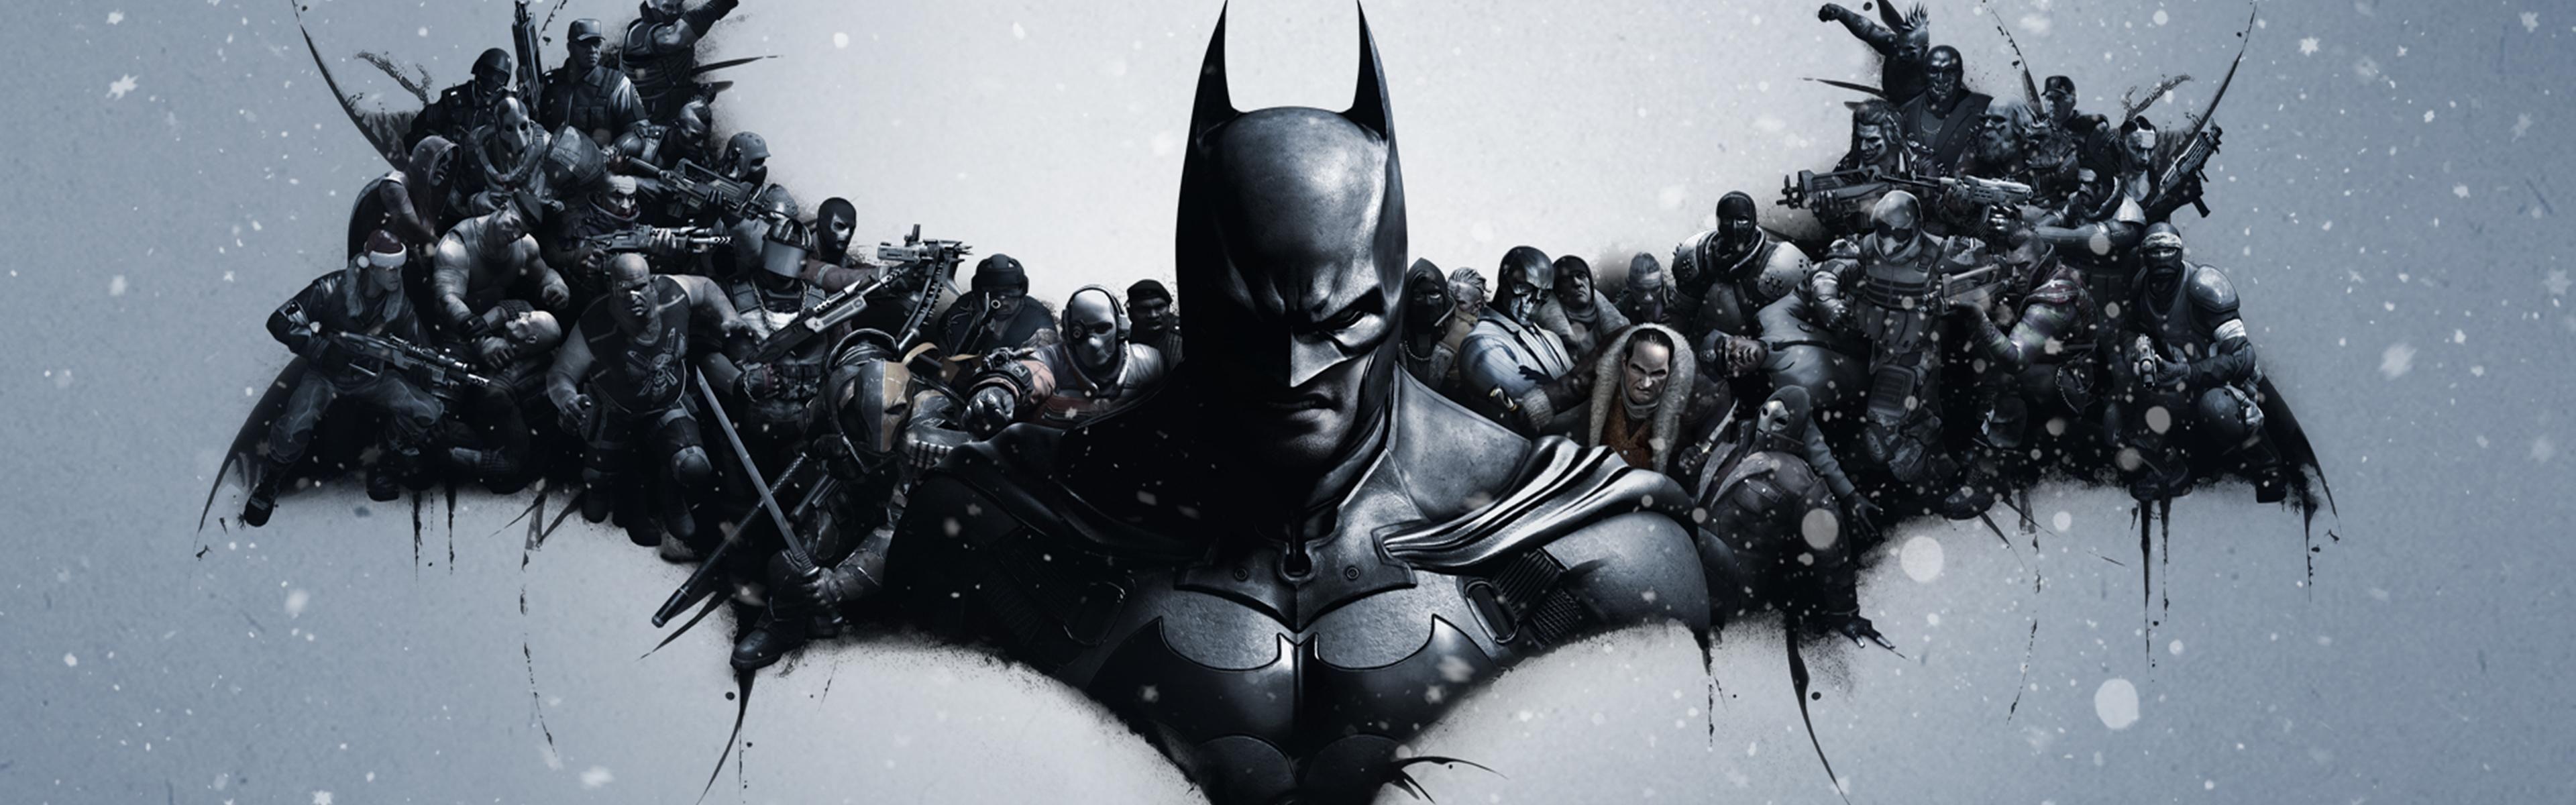 Batman Logo Dual Screen 4k Wallpaper G Batman Batman Arkham